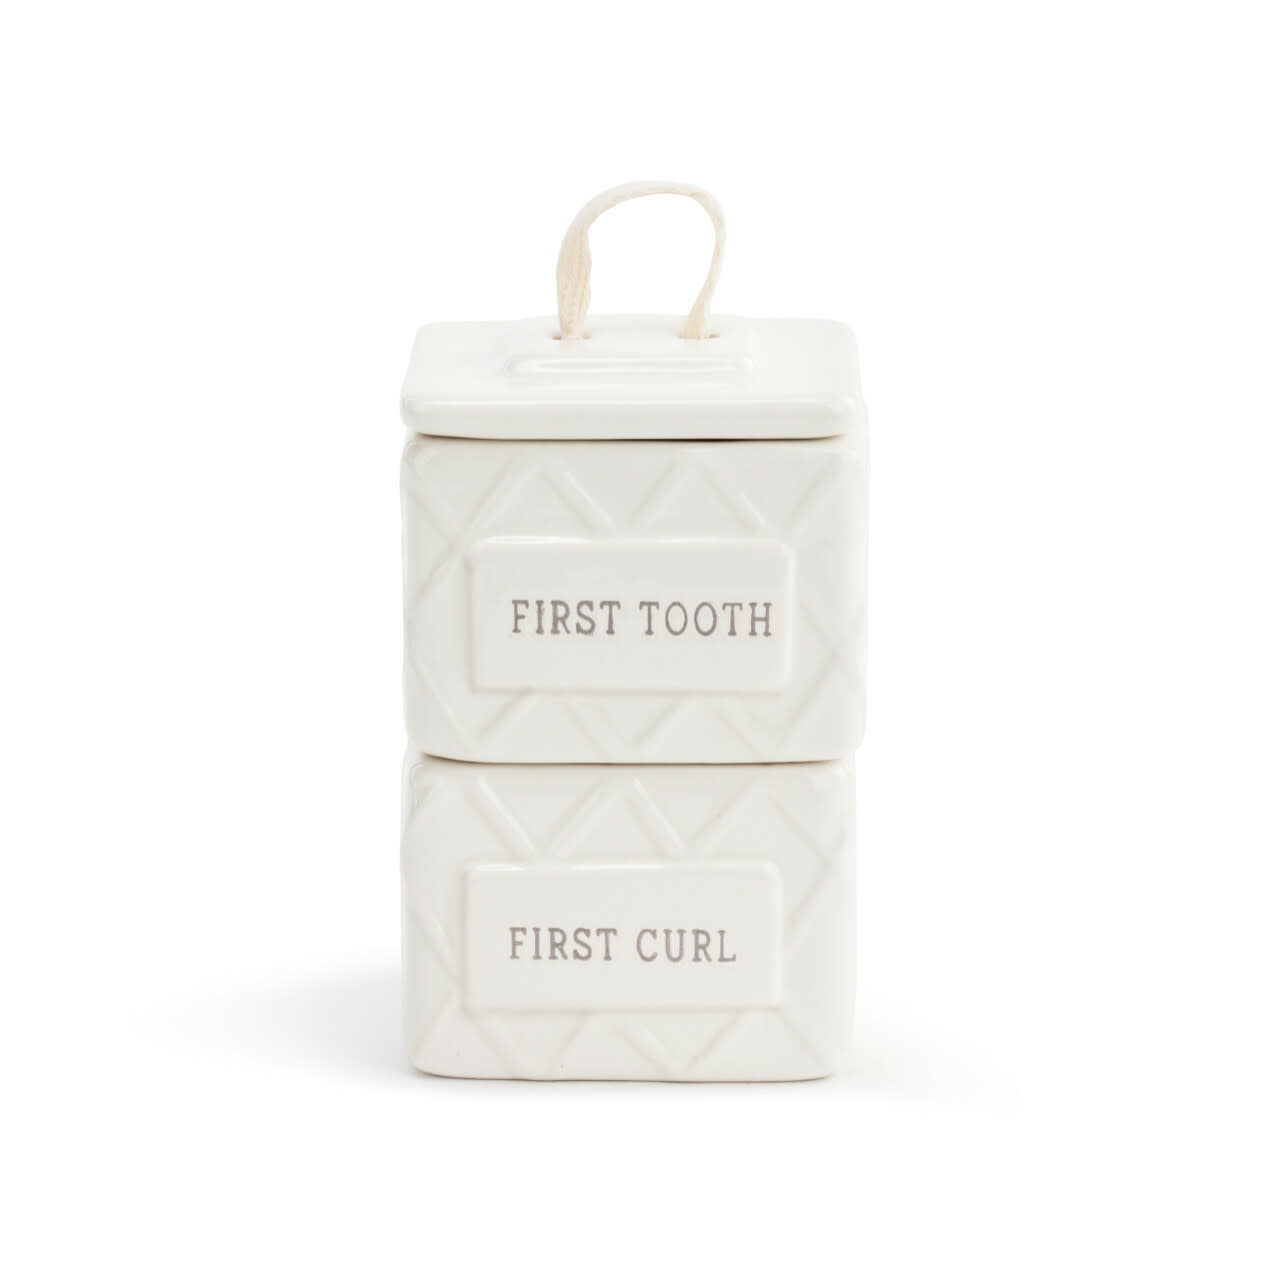 demdaco Koala Tooth/Curl Box